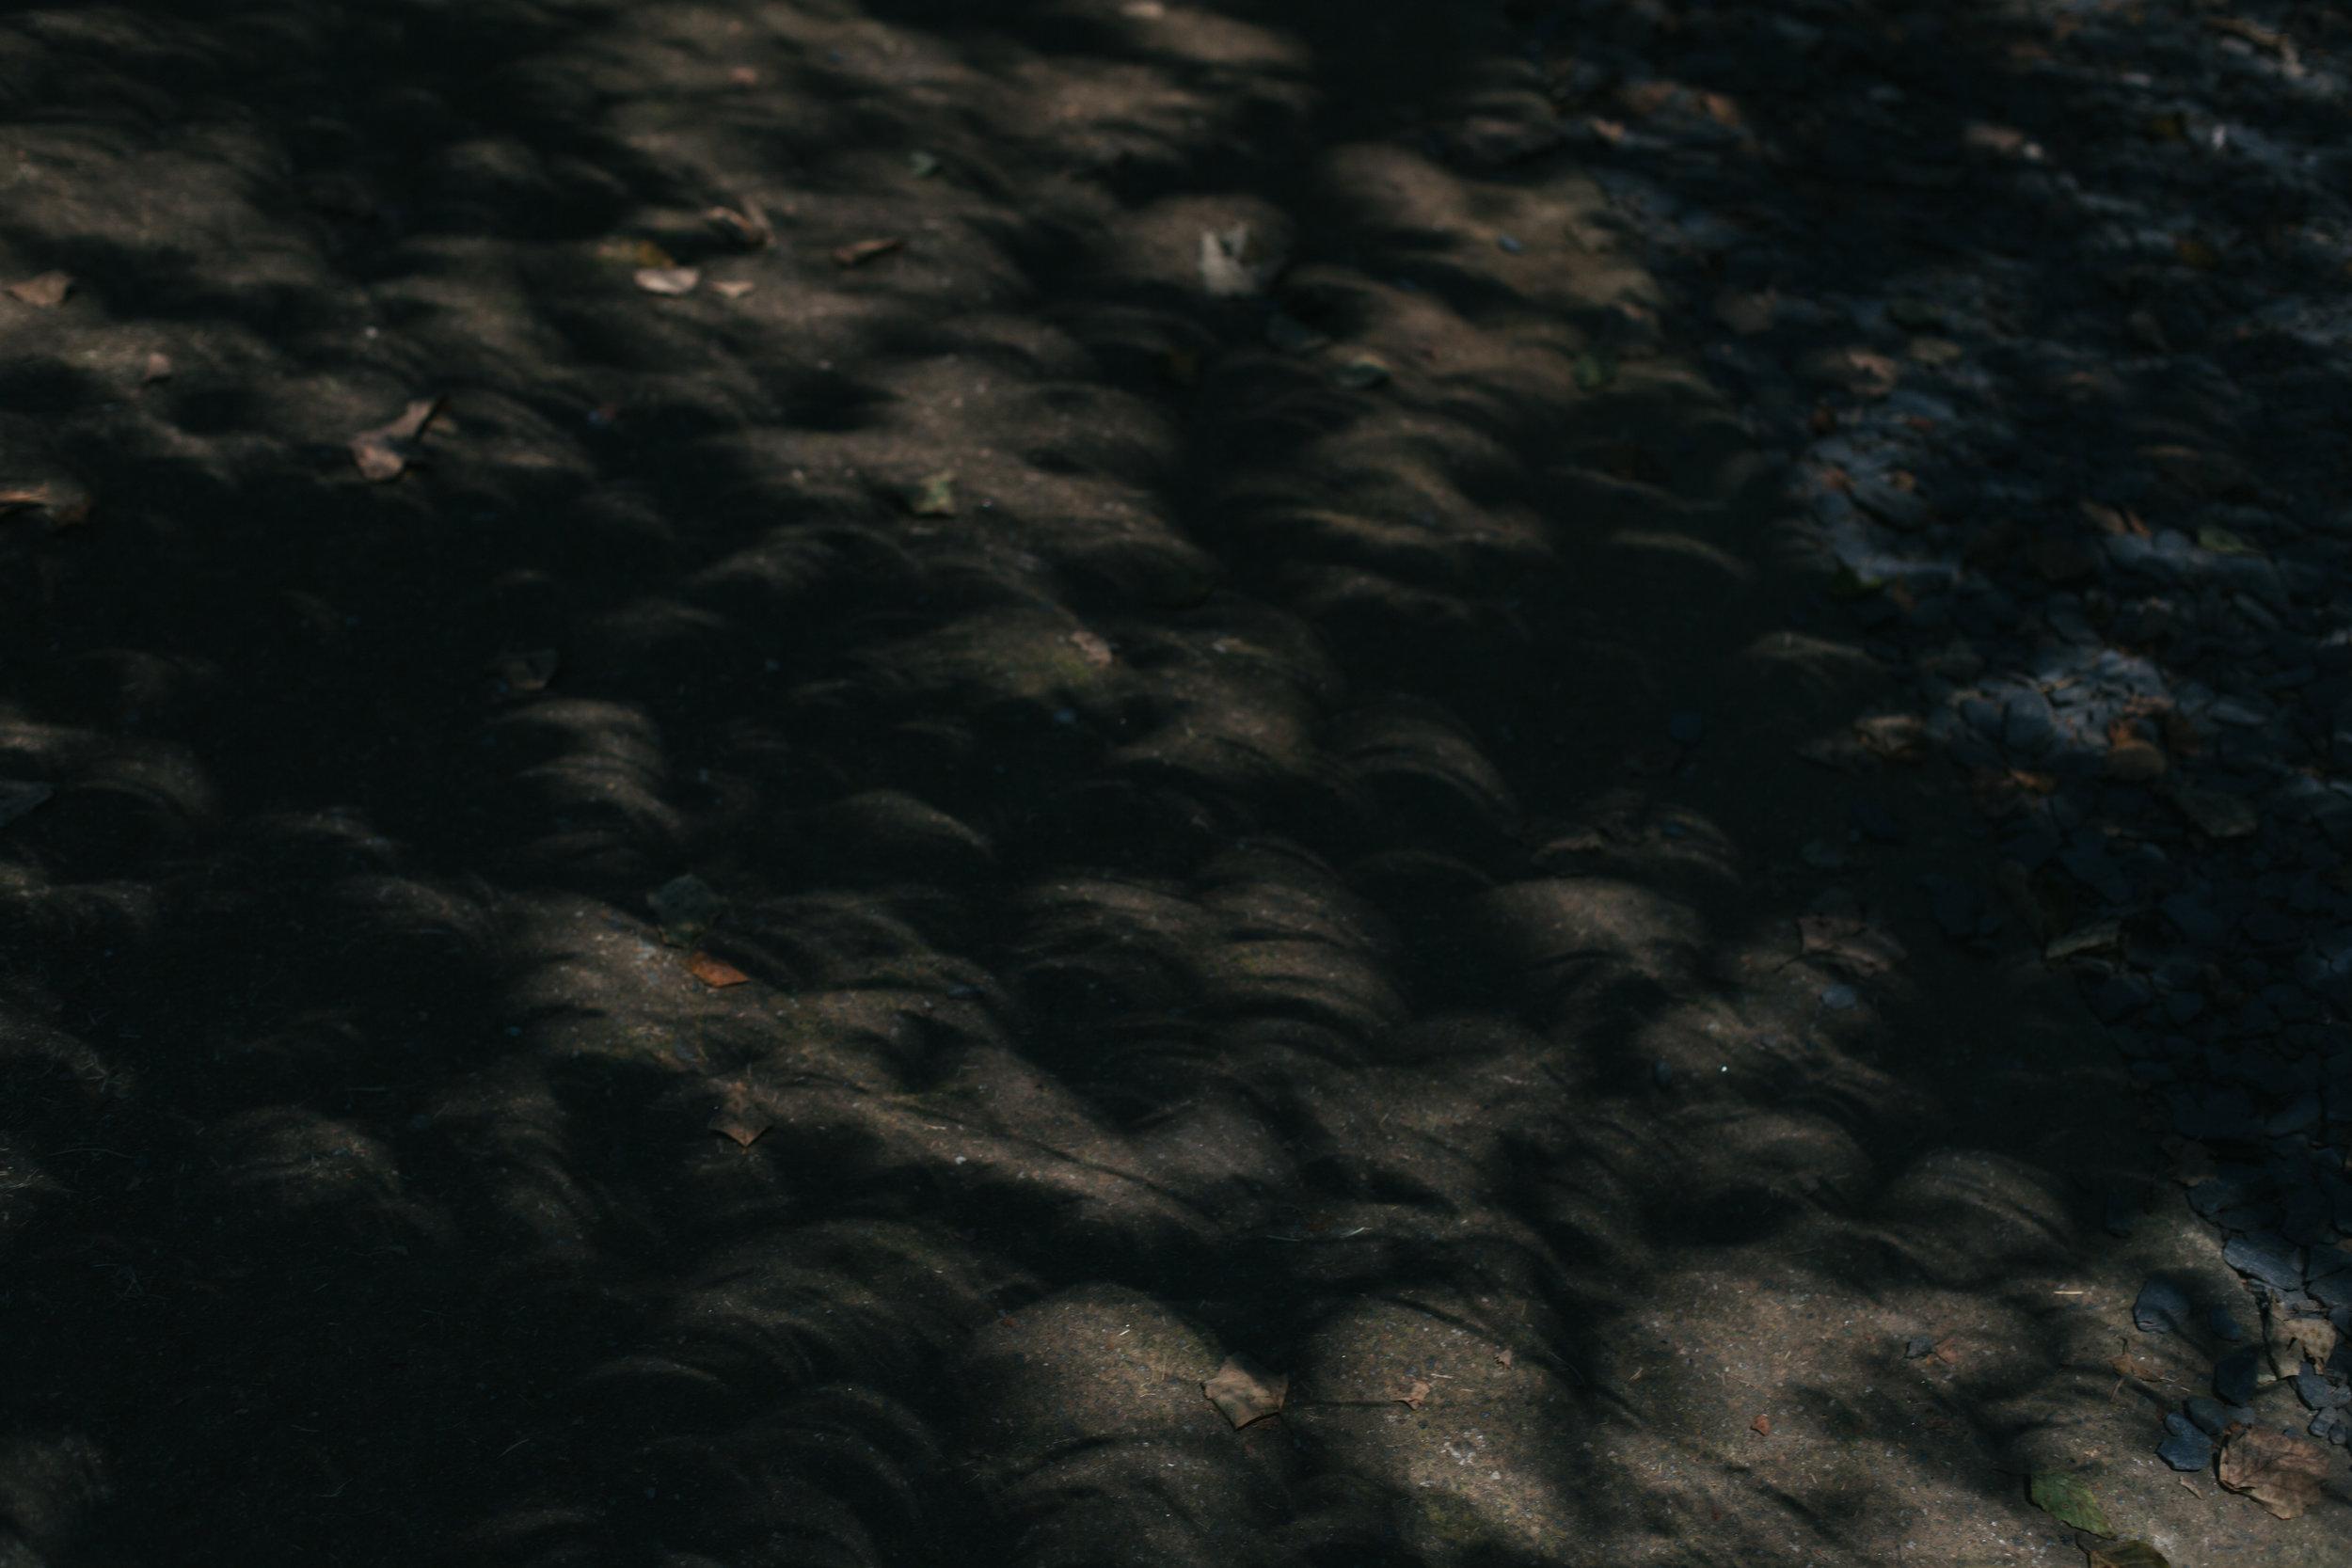 ft_white_eclipse (2 of 17).jpg